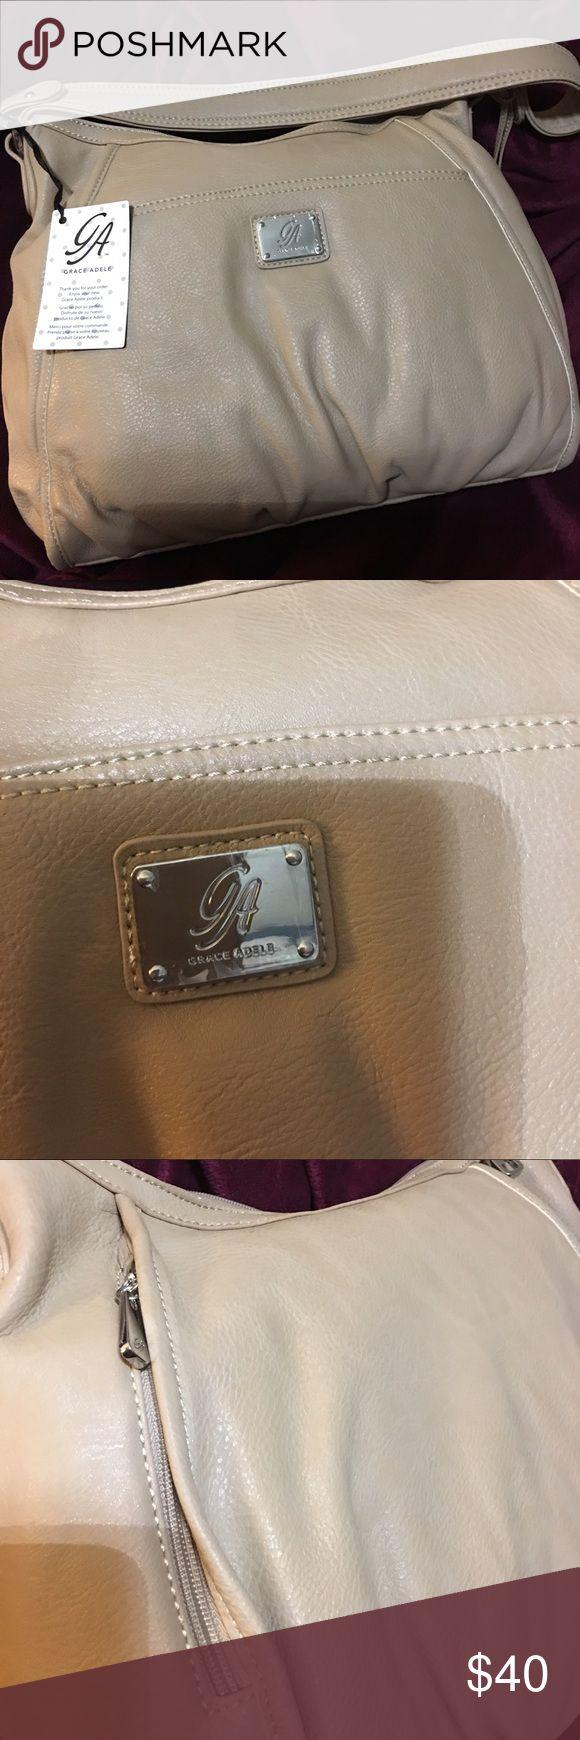 New Tan Grace Adele Purse NWOT Grace Adele Purse, Tan, Front snap pocket, back hidden zip pocket, Grace Adele Bags Shoulder Bags